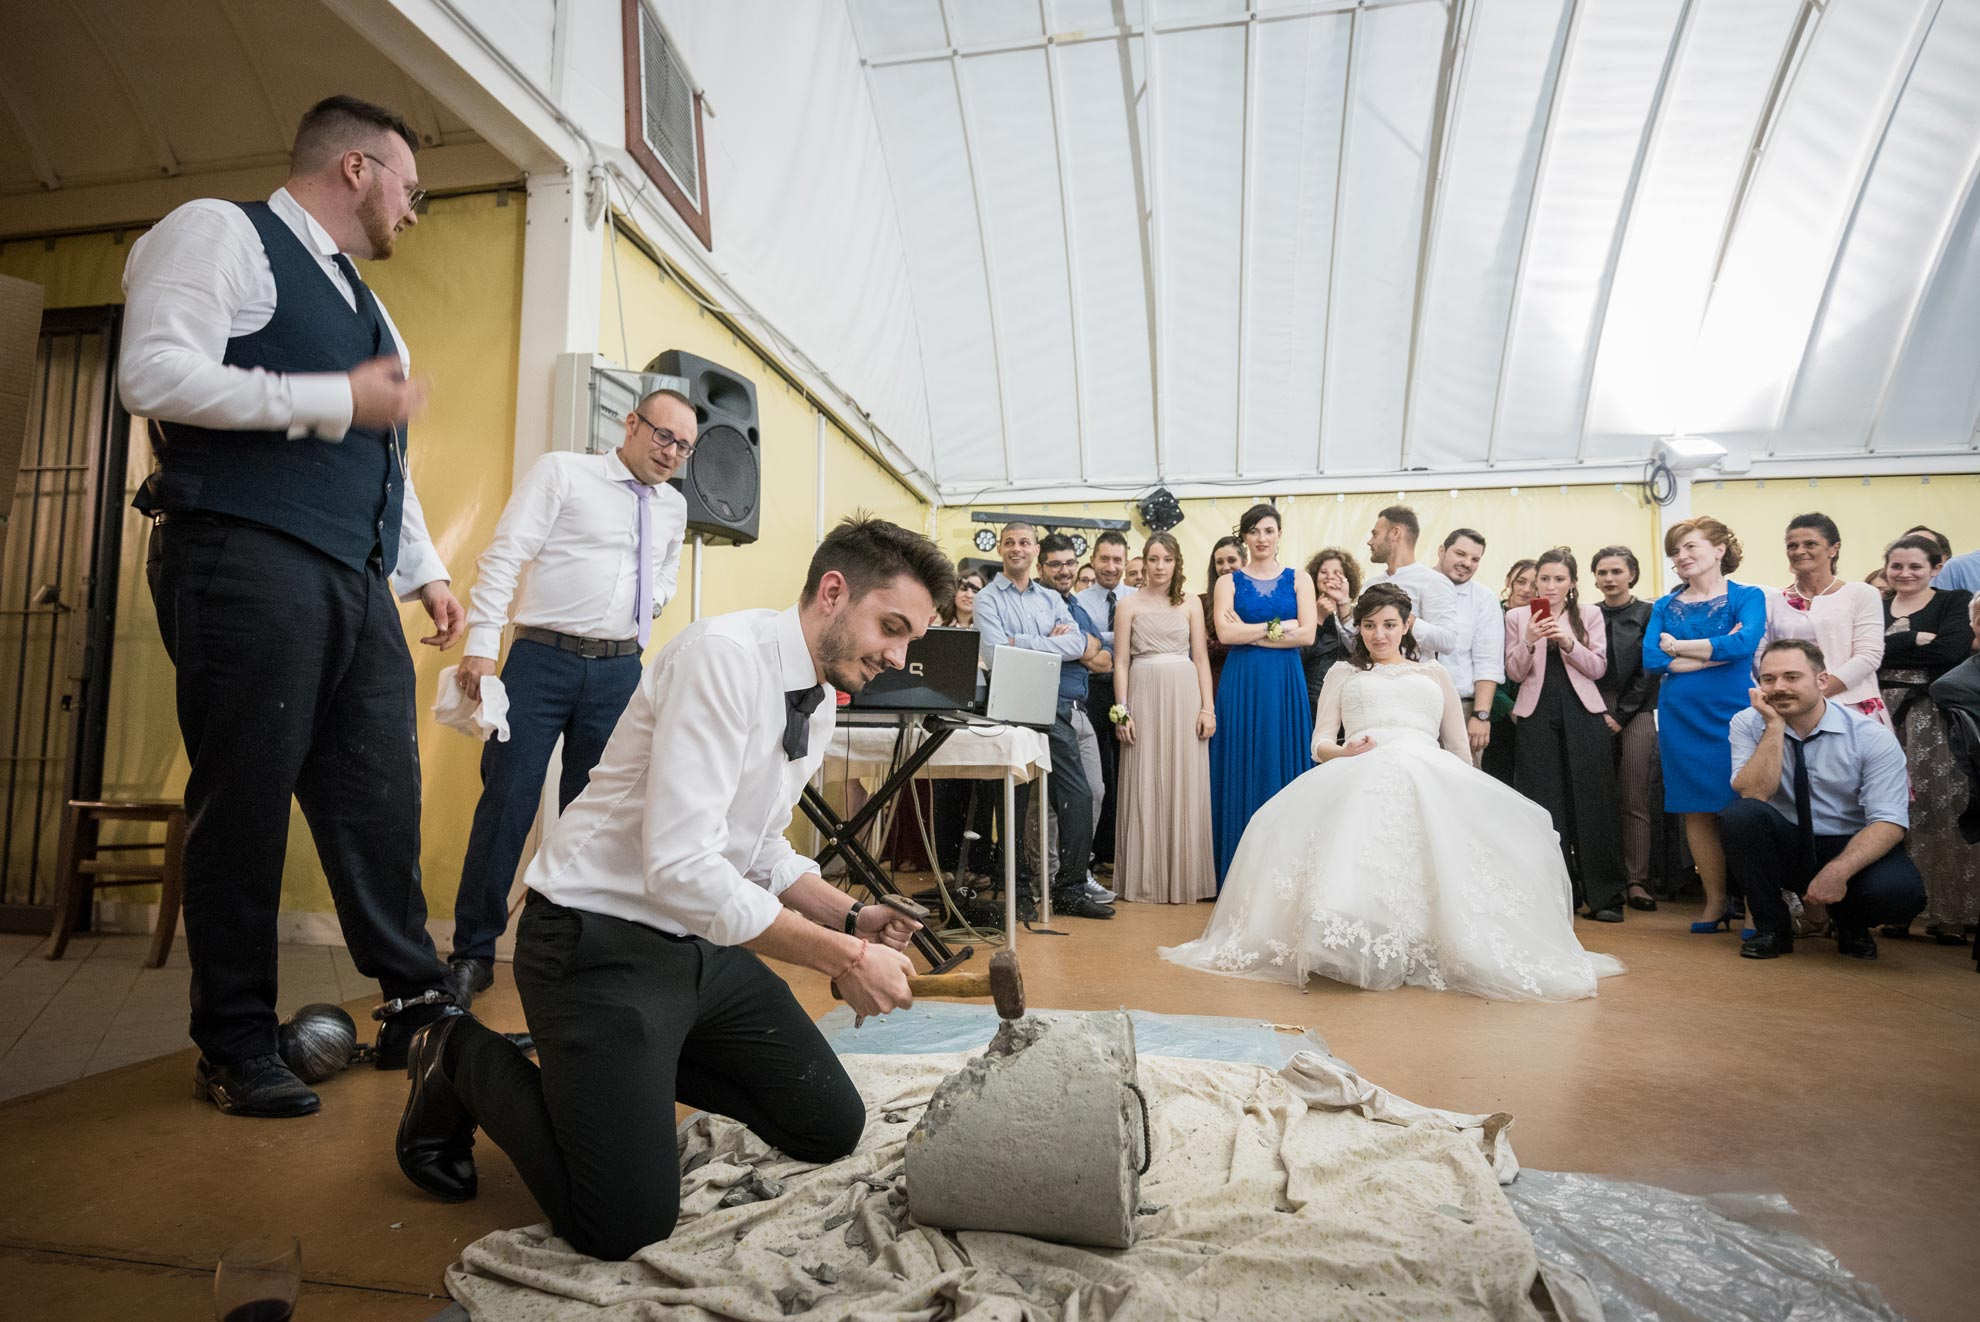 Matrimonio a Narzole Lorenza Diego - DSC 0837 - Fotografie testimoni matrimonio - Fotografie testimoni matrimonio